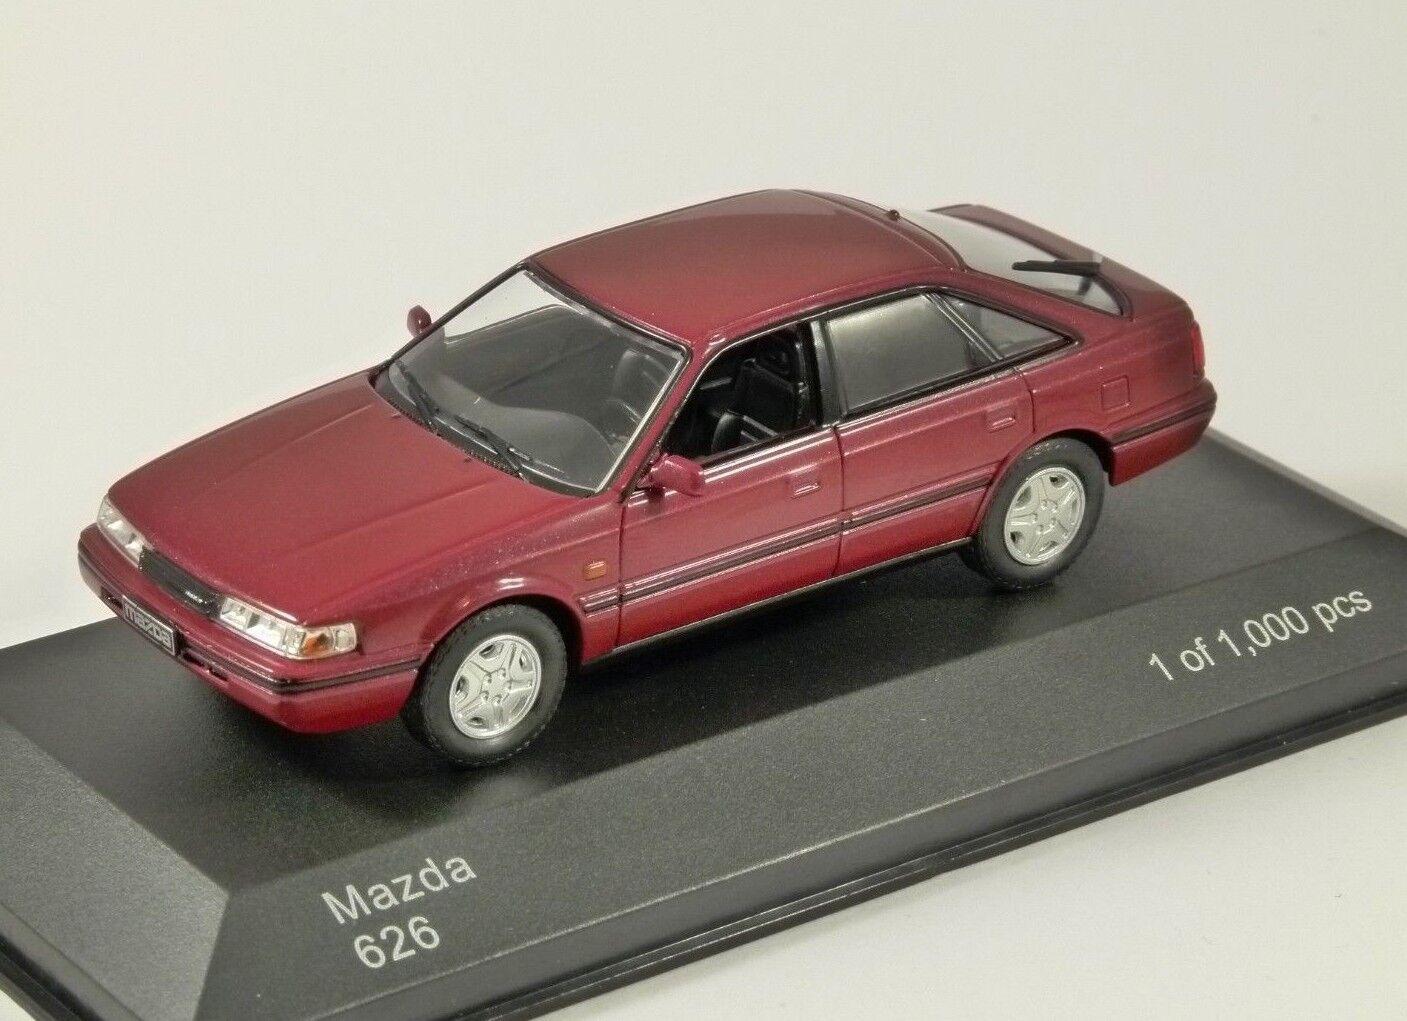 1990 MAZDA 626 in Red 1 43 scale model by Whitebox